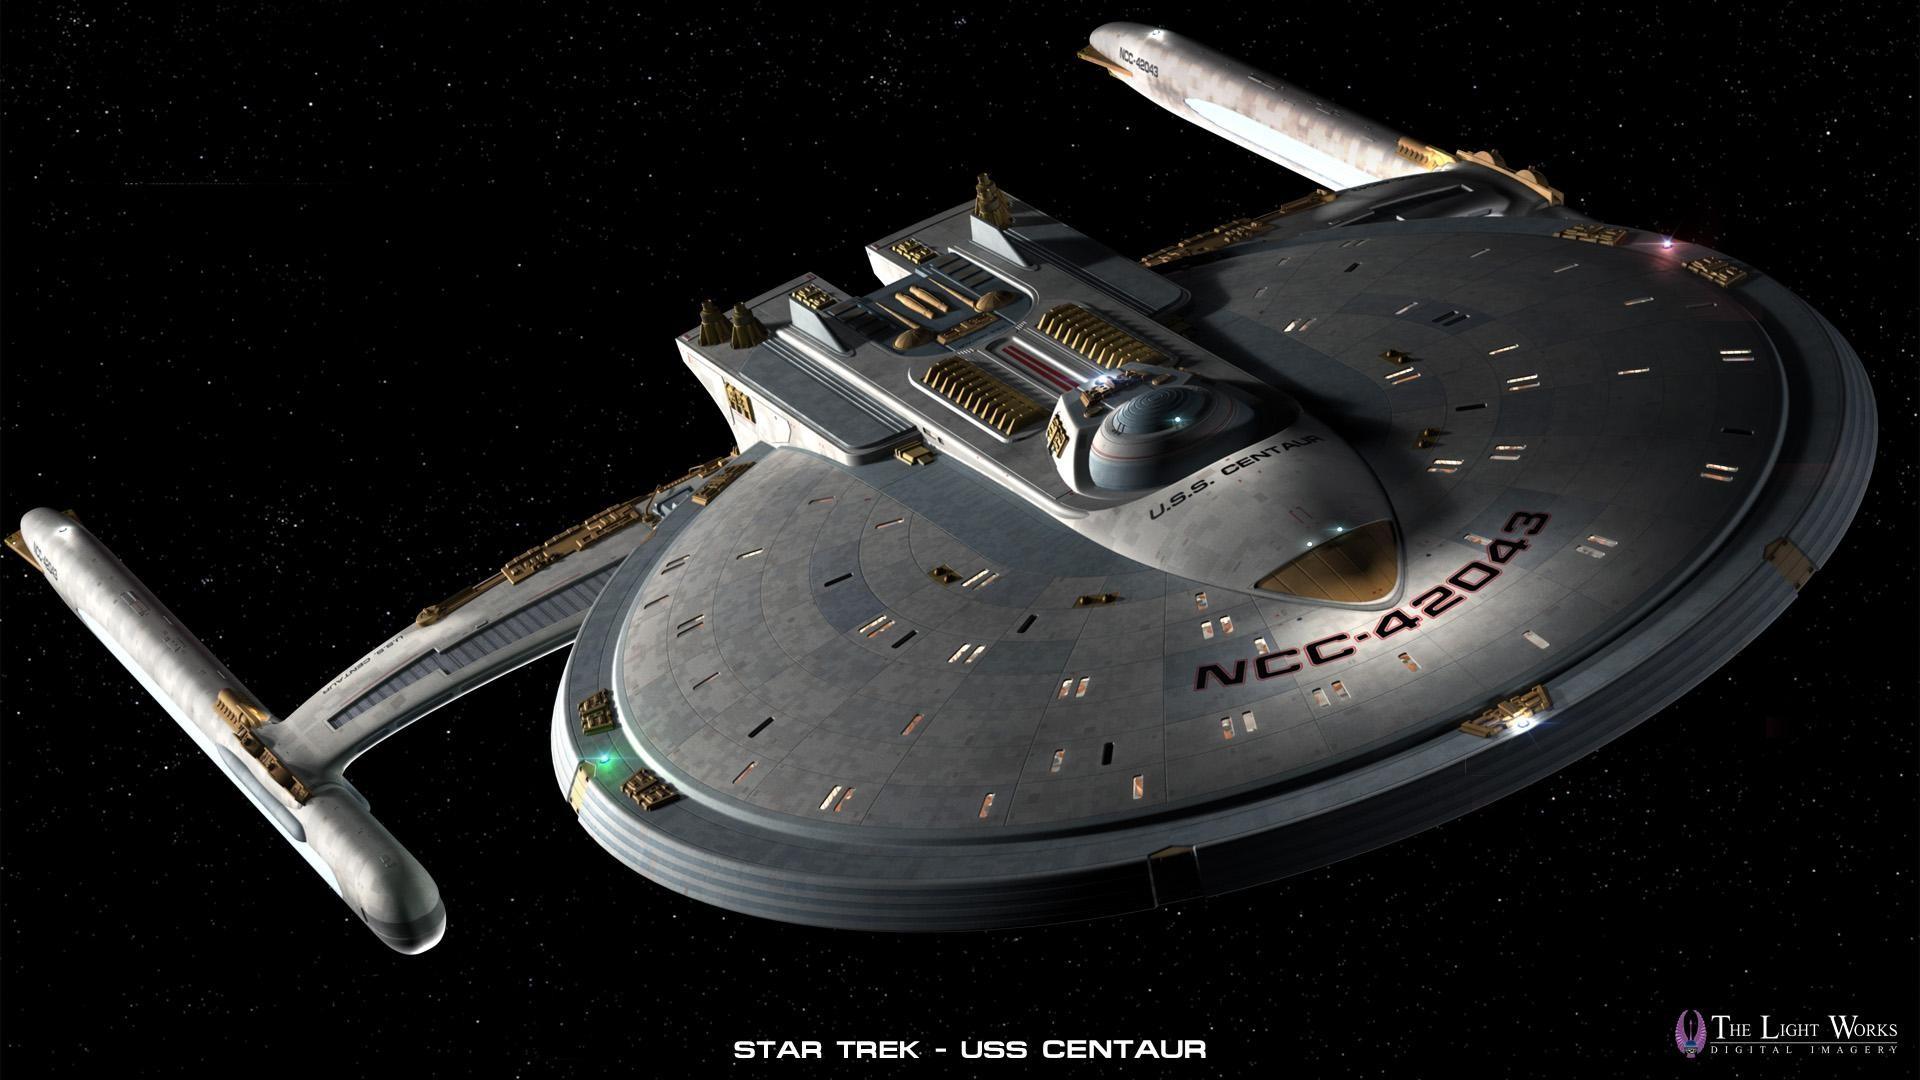 USS Centaur (Star Trek) [1920×1080] Need #iPhone #6S #Plus